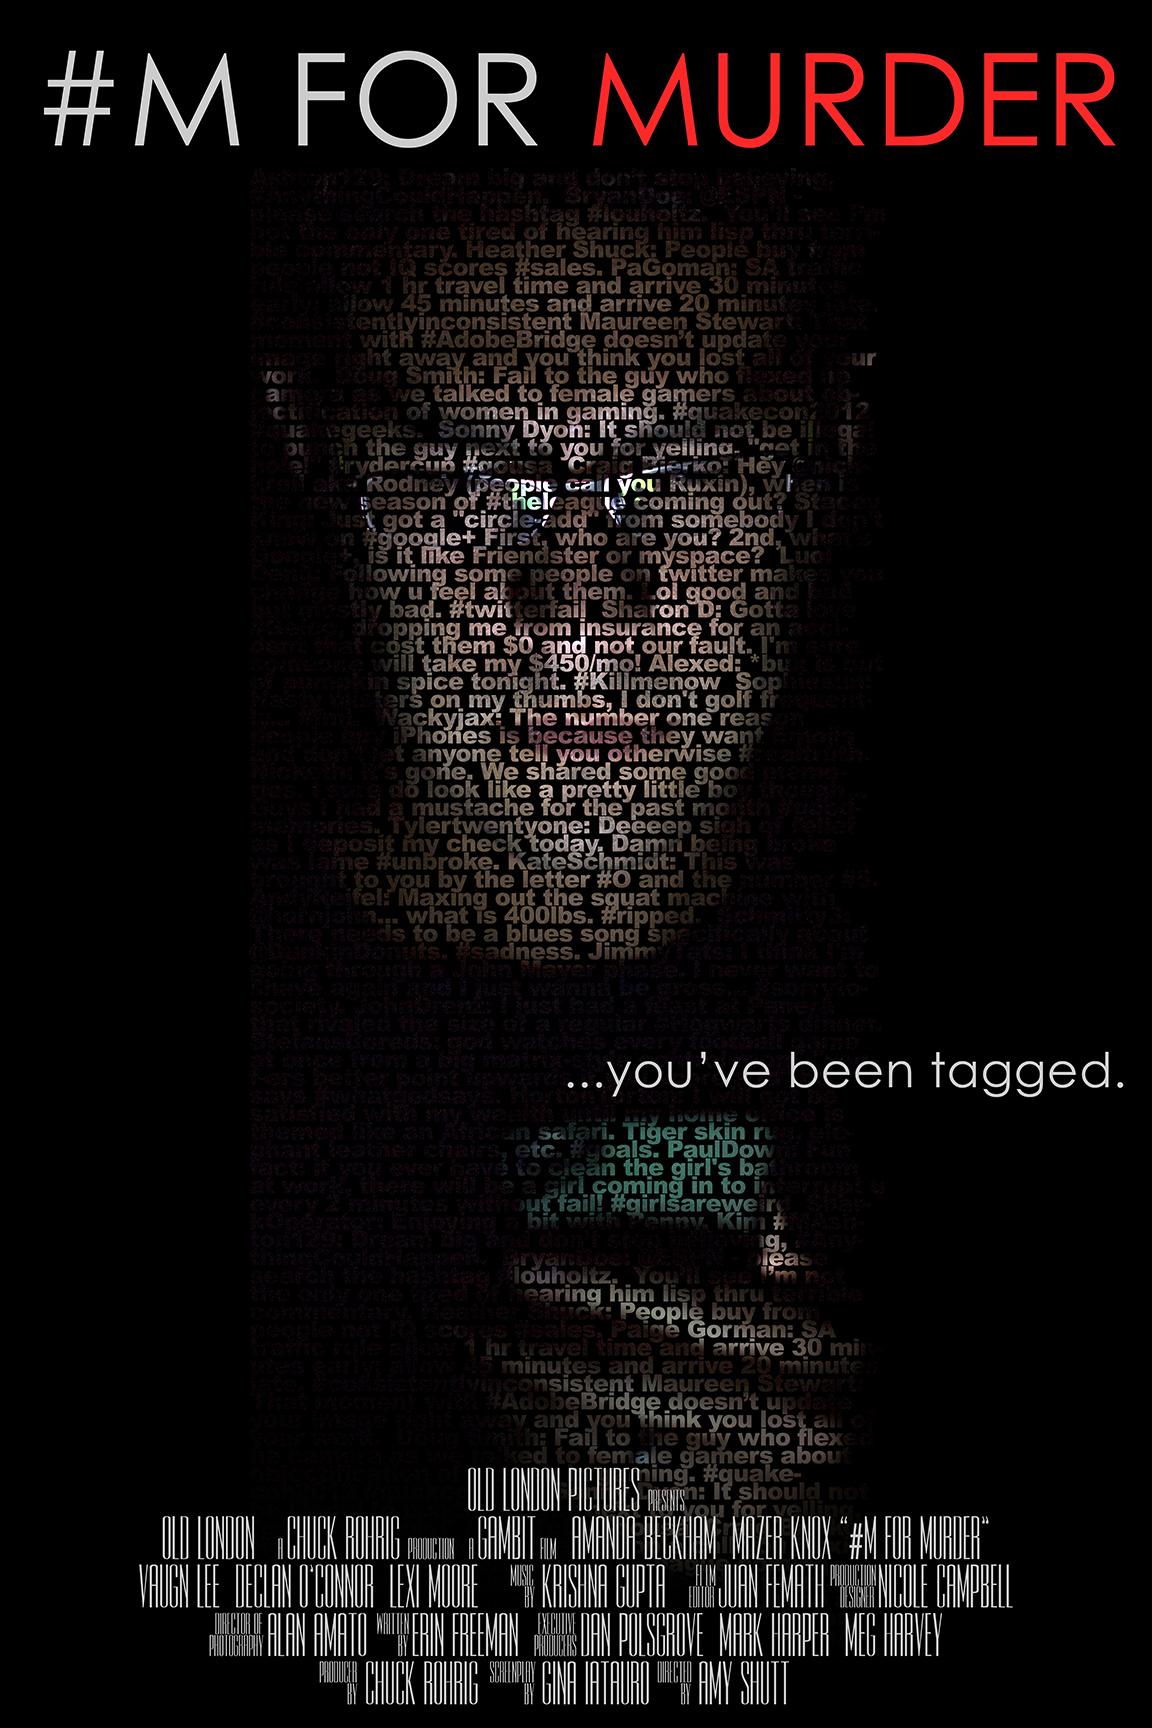 Movie_Poster_lo_res.jpg